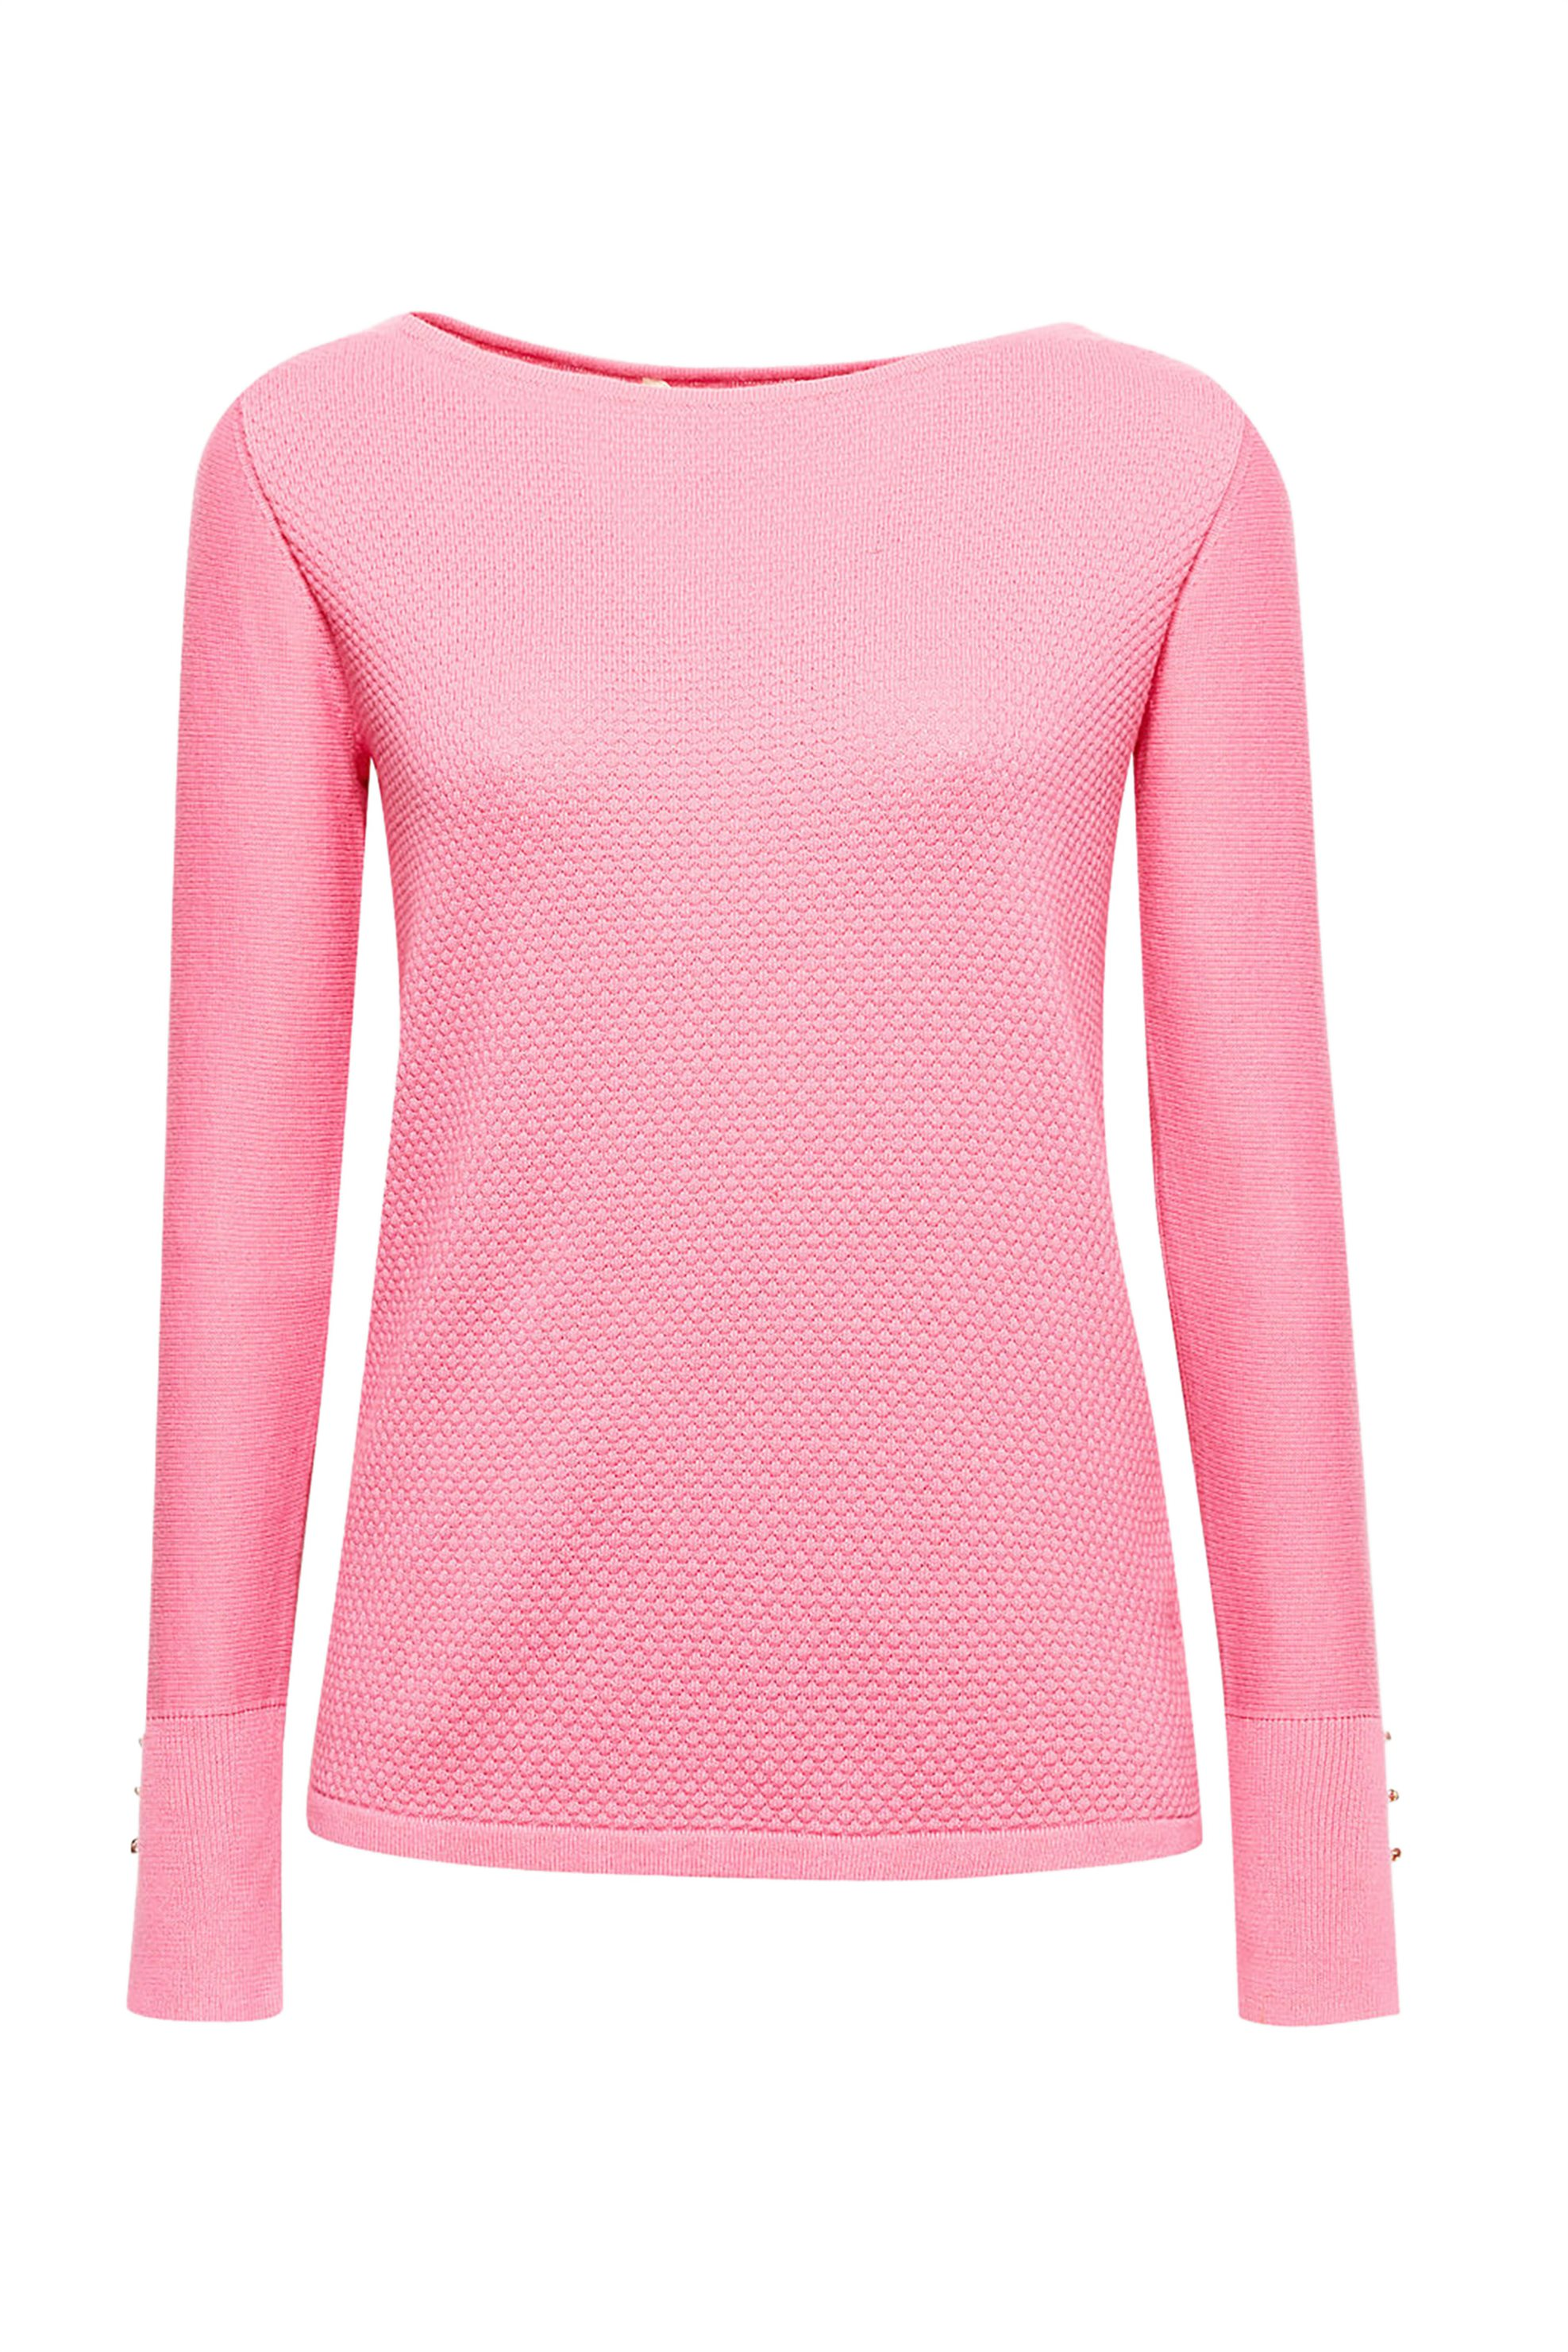 53dfb49deb48 Γυναικεία   Ρούχα   Πλεκτά   Μπλούζες   Λεπτό πουλόβερ με άνοιγμα ...